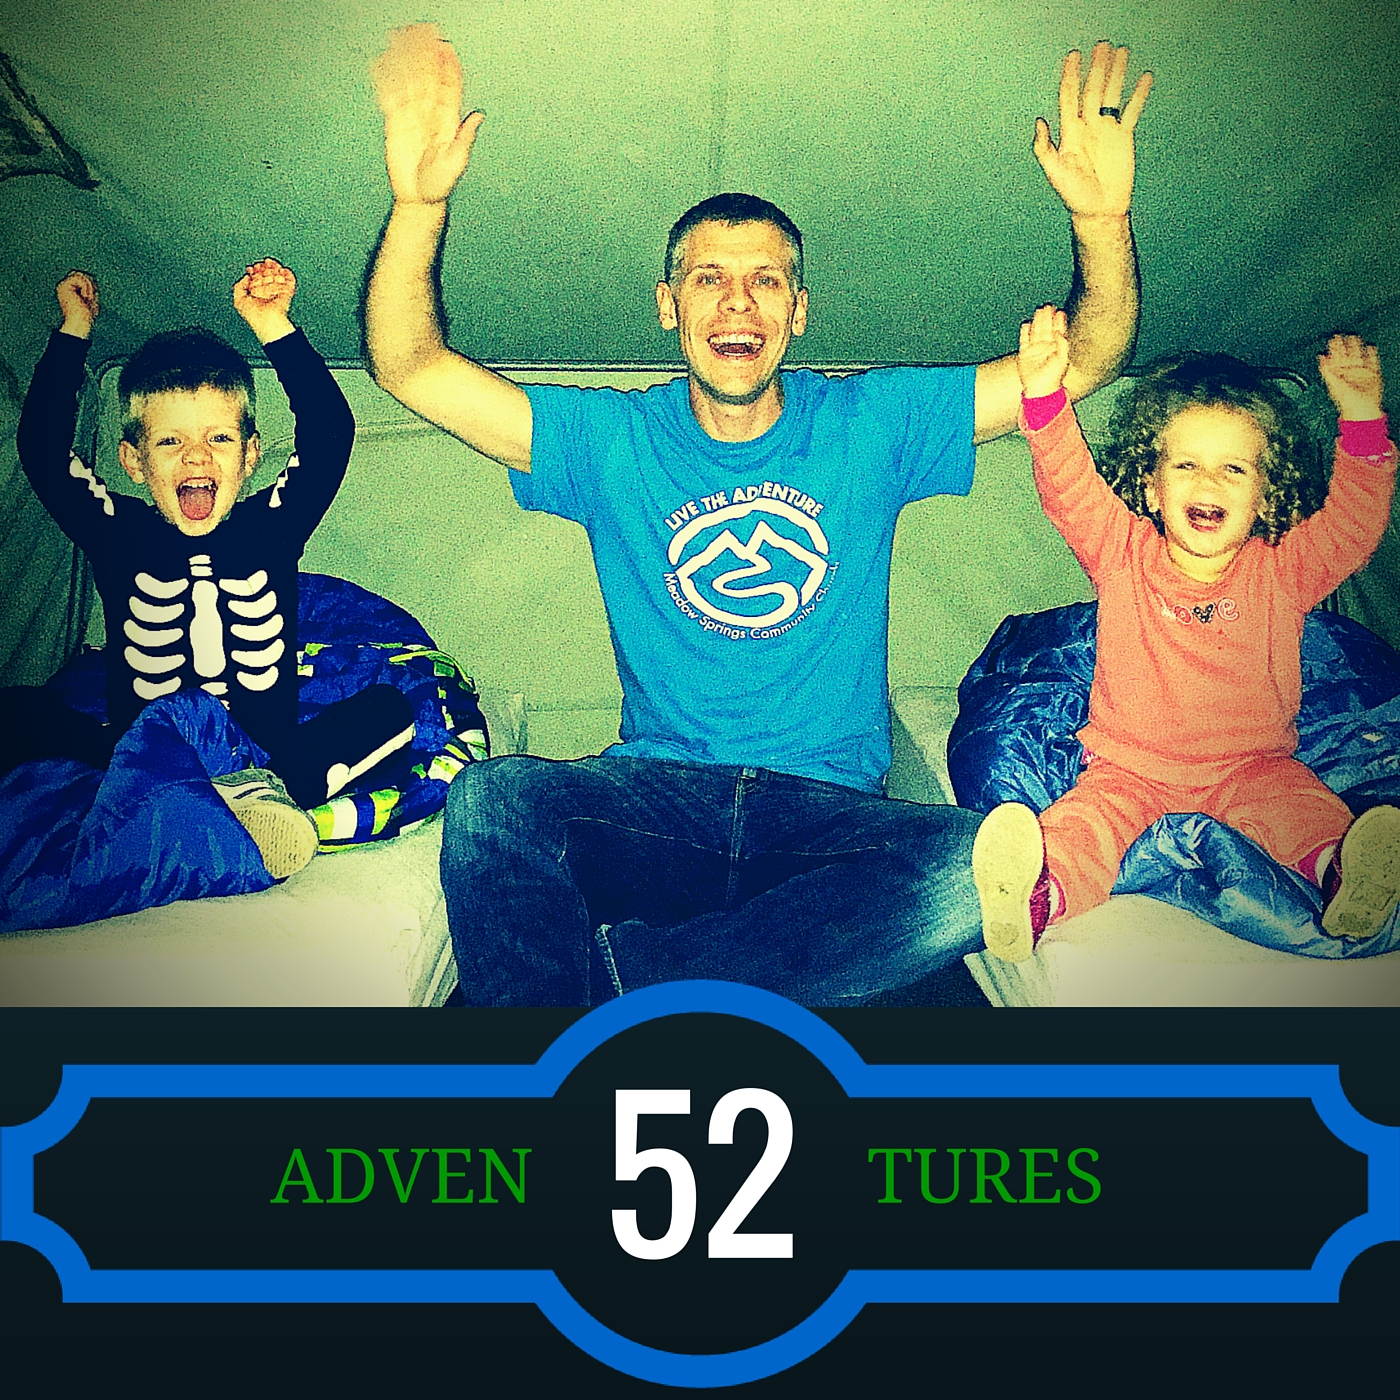 52 Adventures